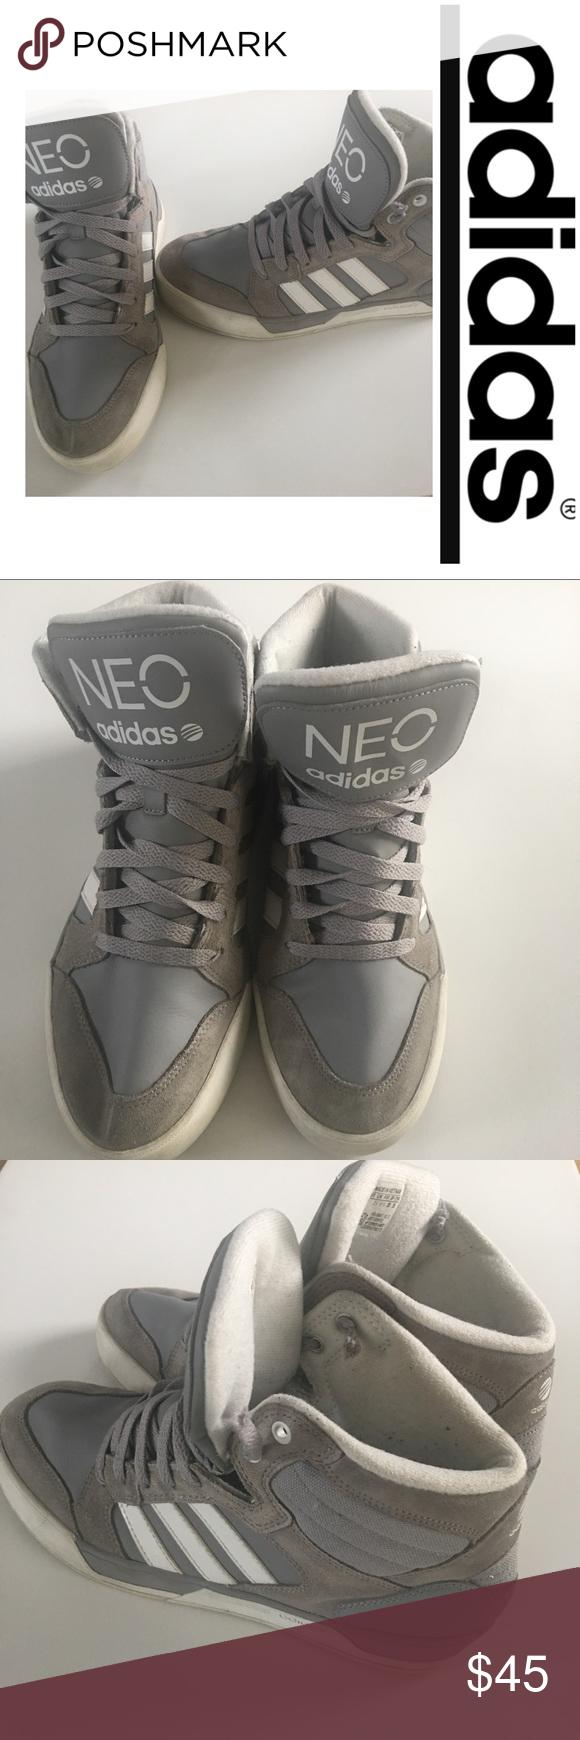 Adidas Stripe neo High Top gris y blanco Stripe Adidas adidas neo High Tops dbee1d